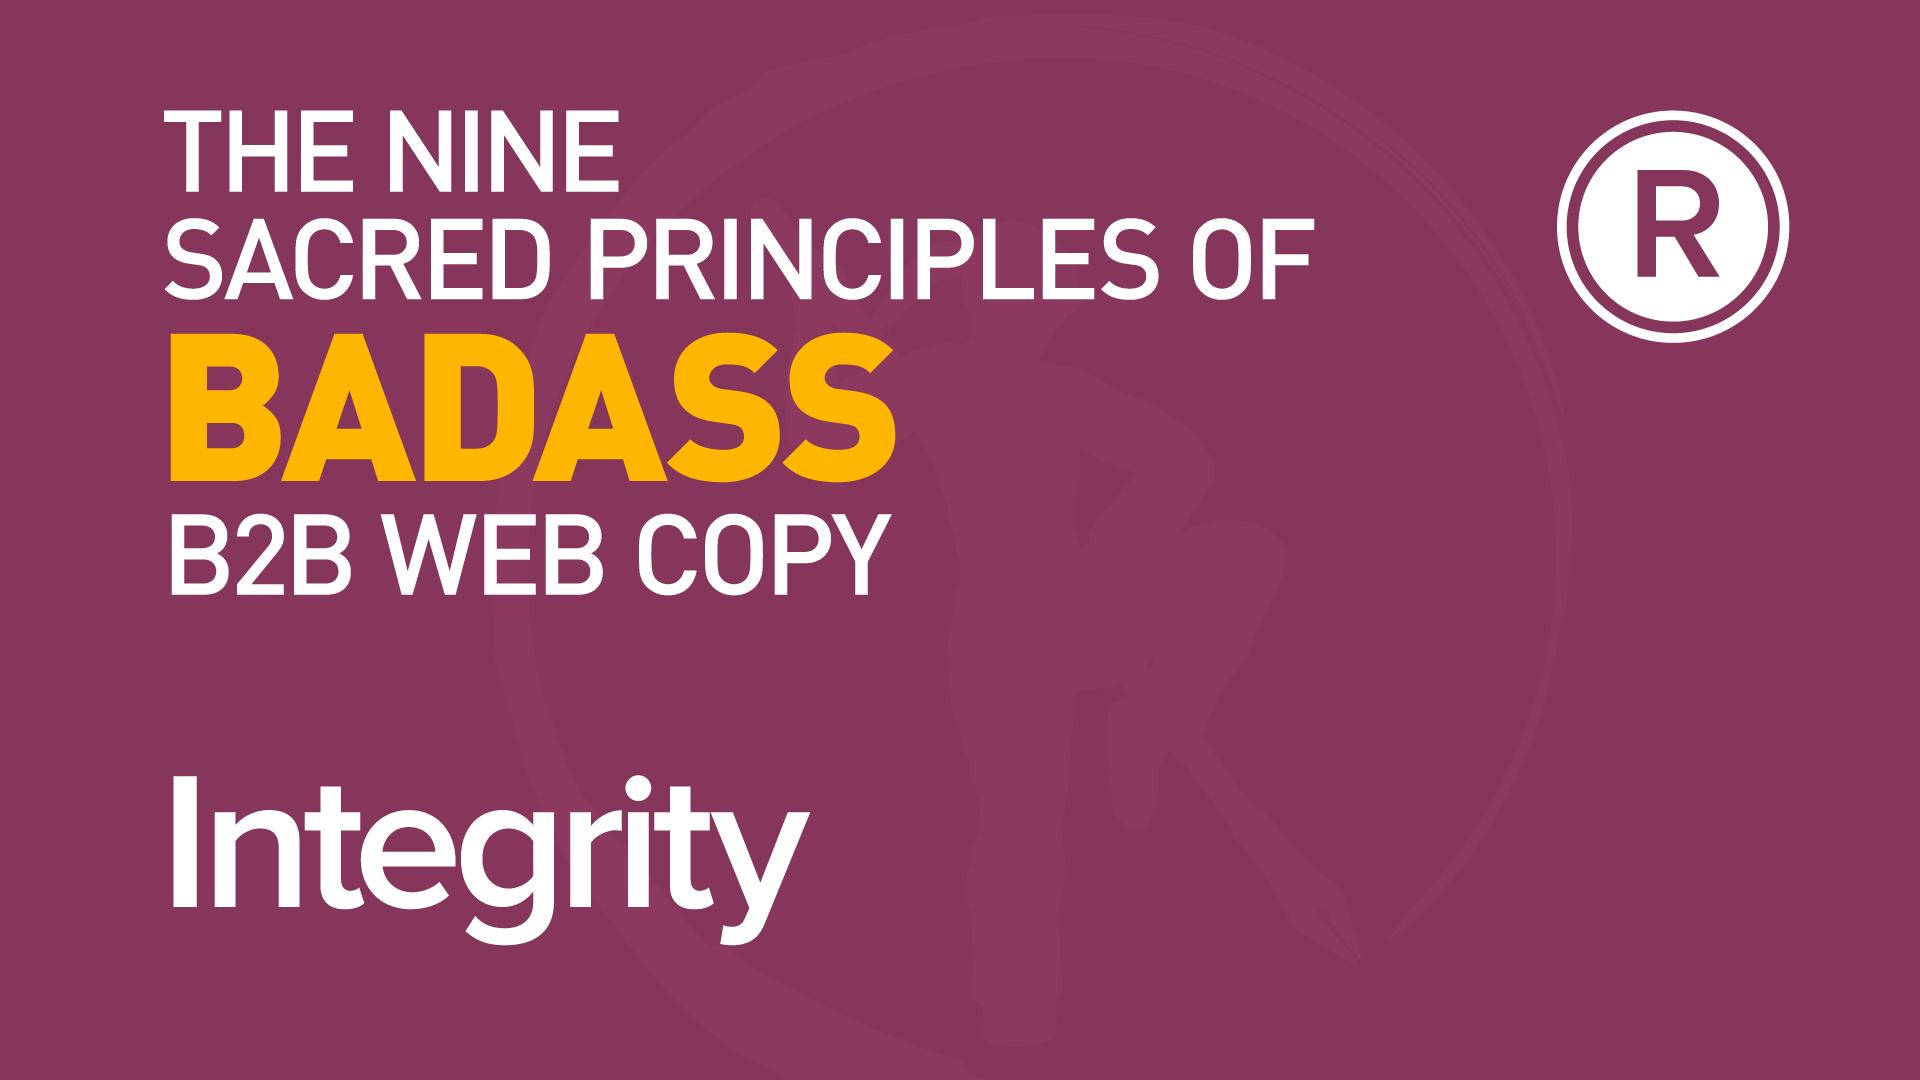 6th principle of badass B2B web copy: Integrity